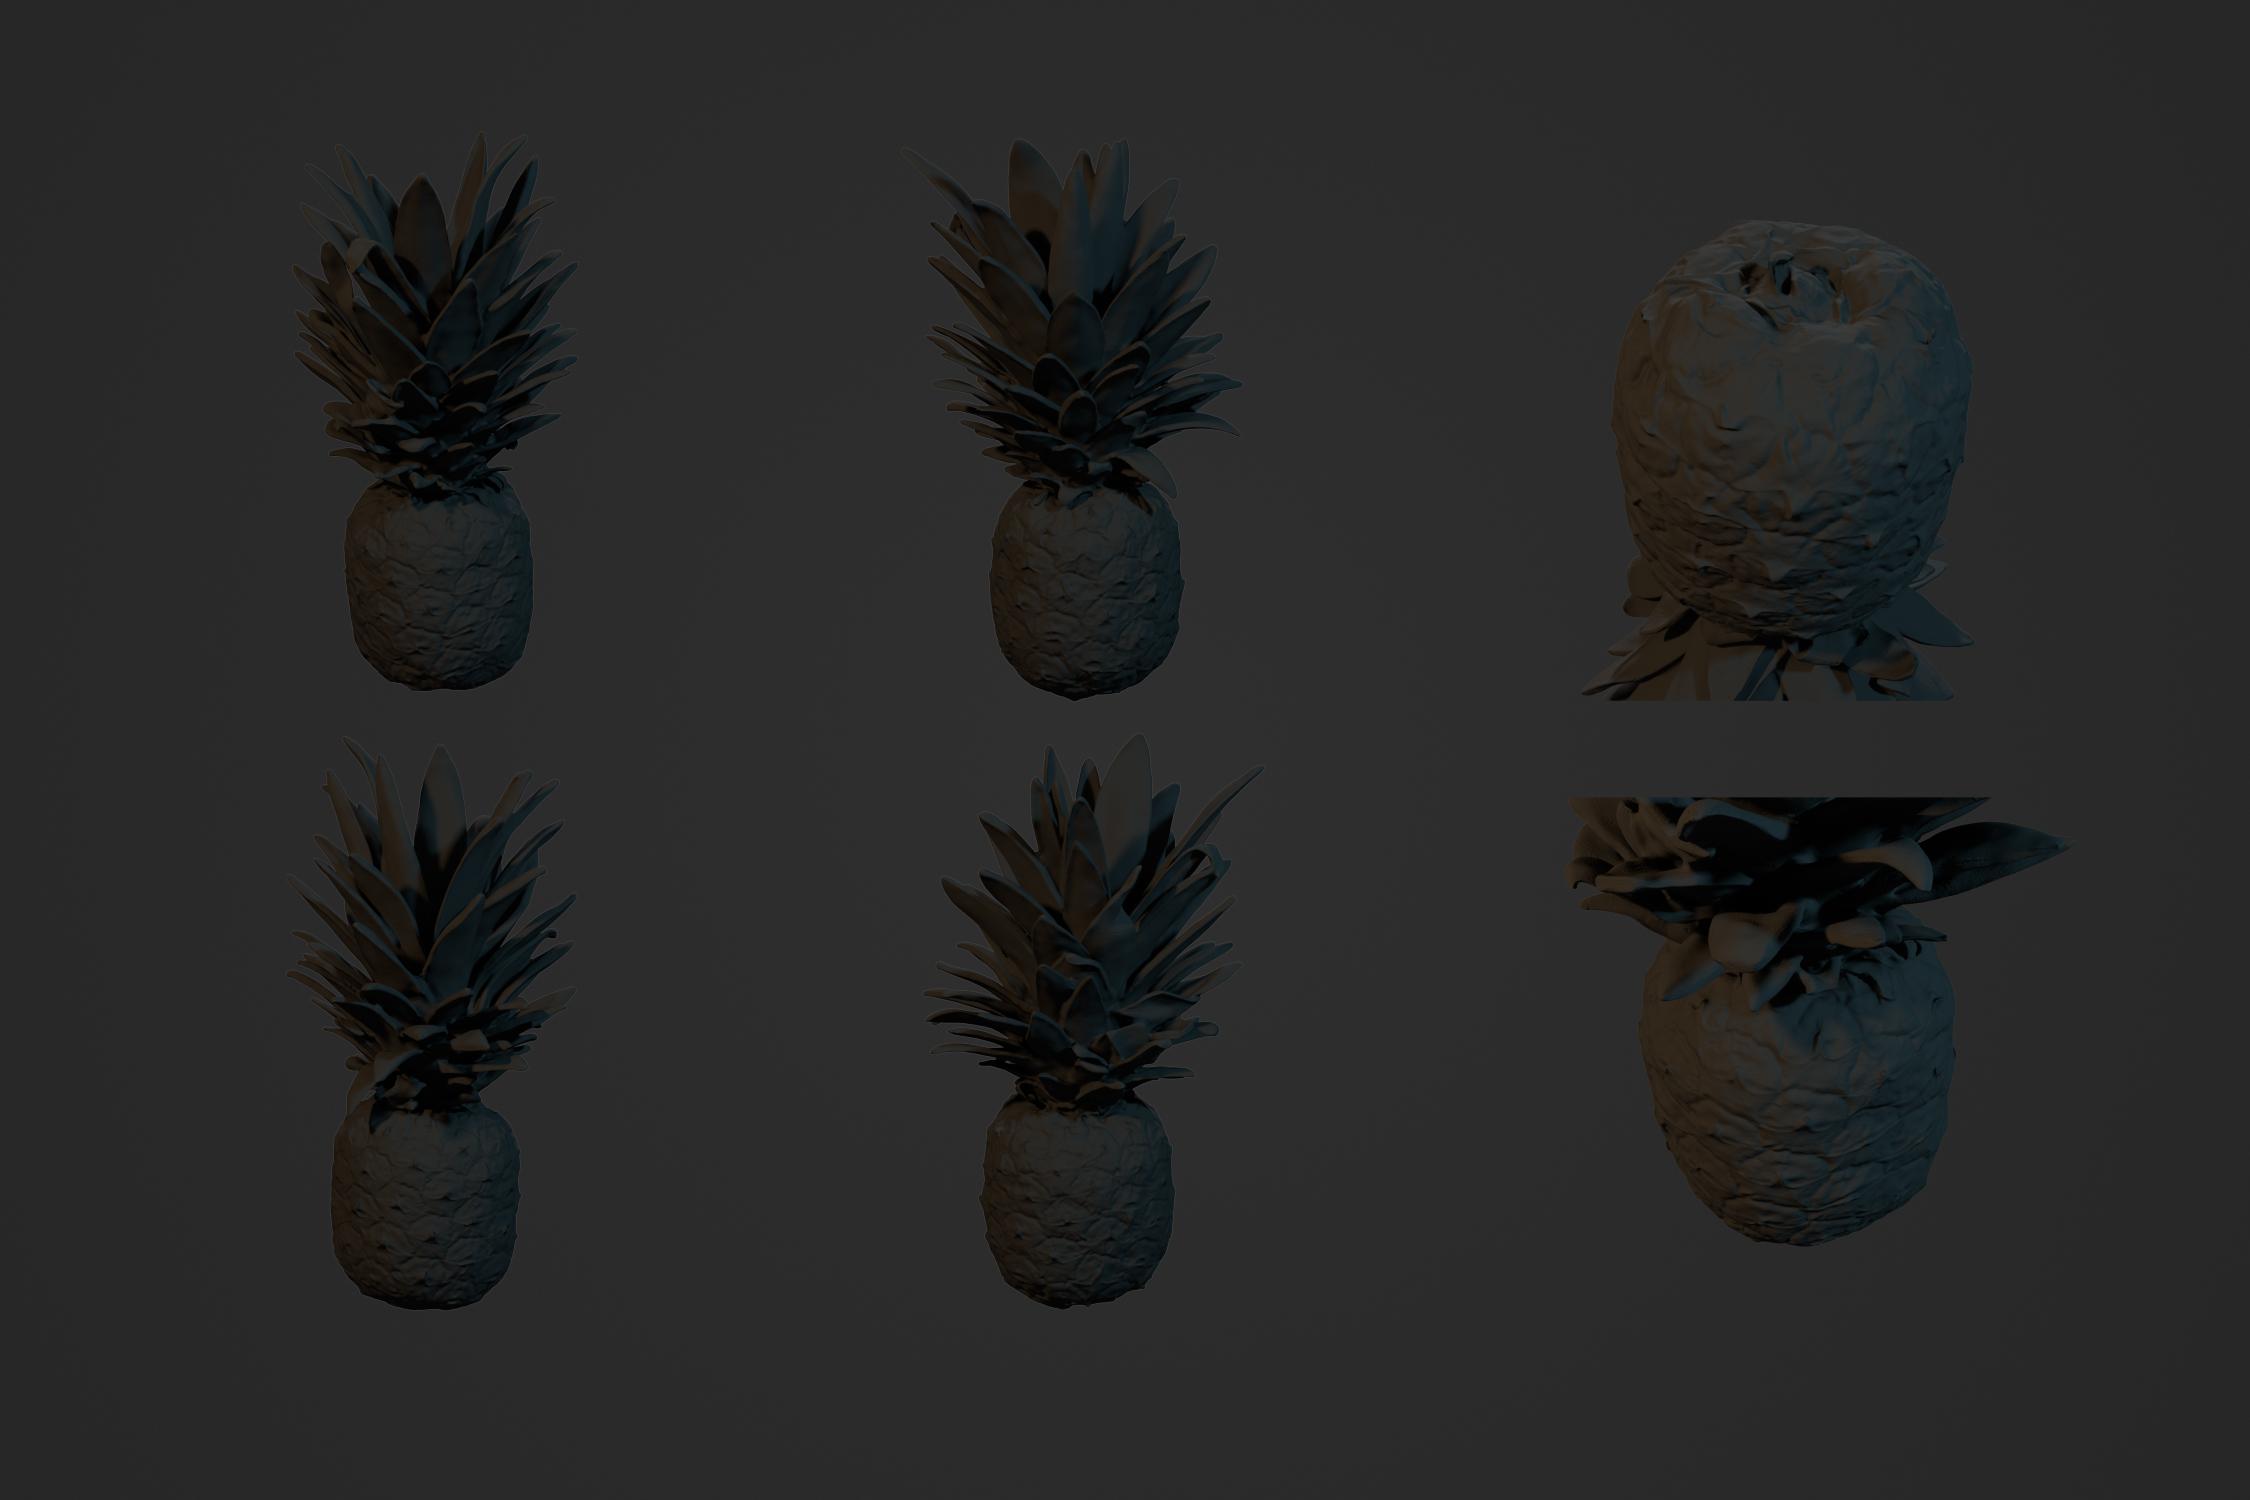 Pineapple_1_0.jpg